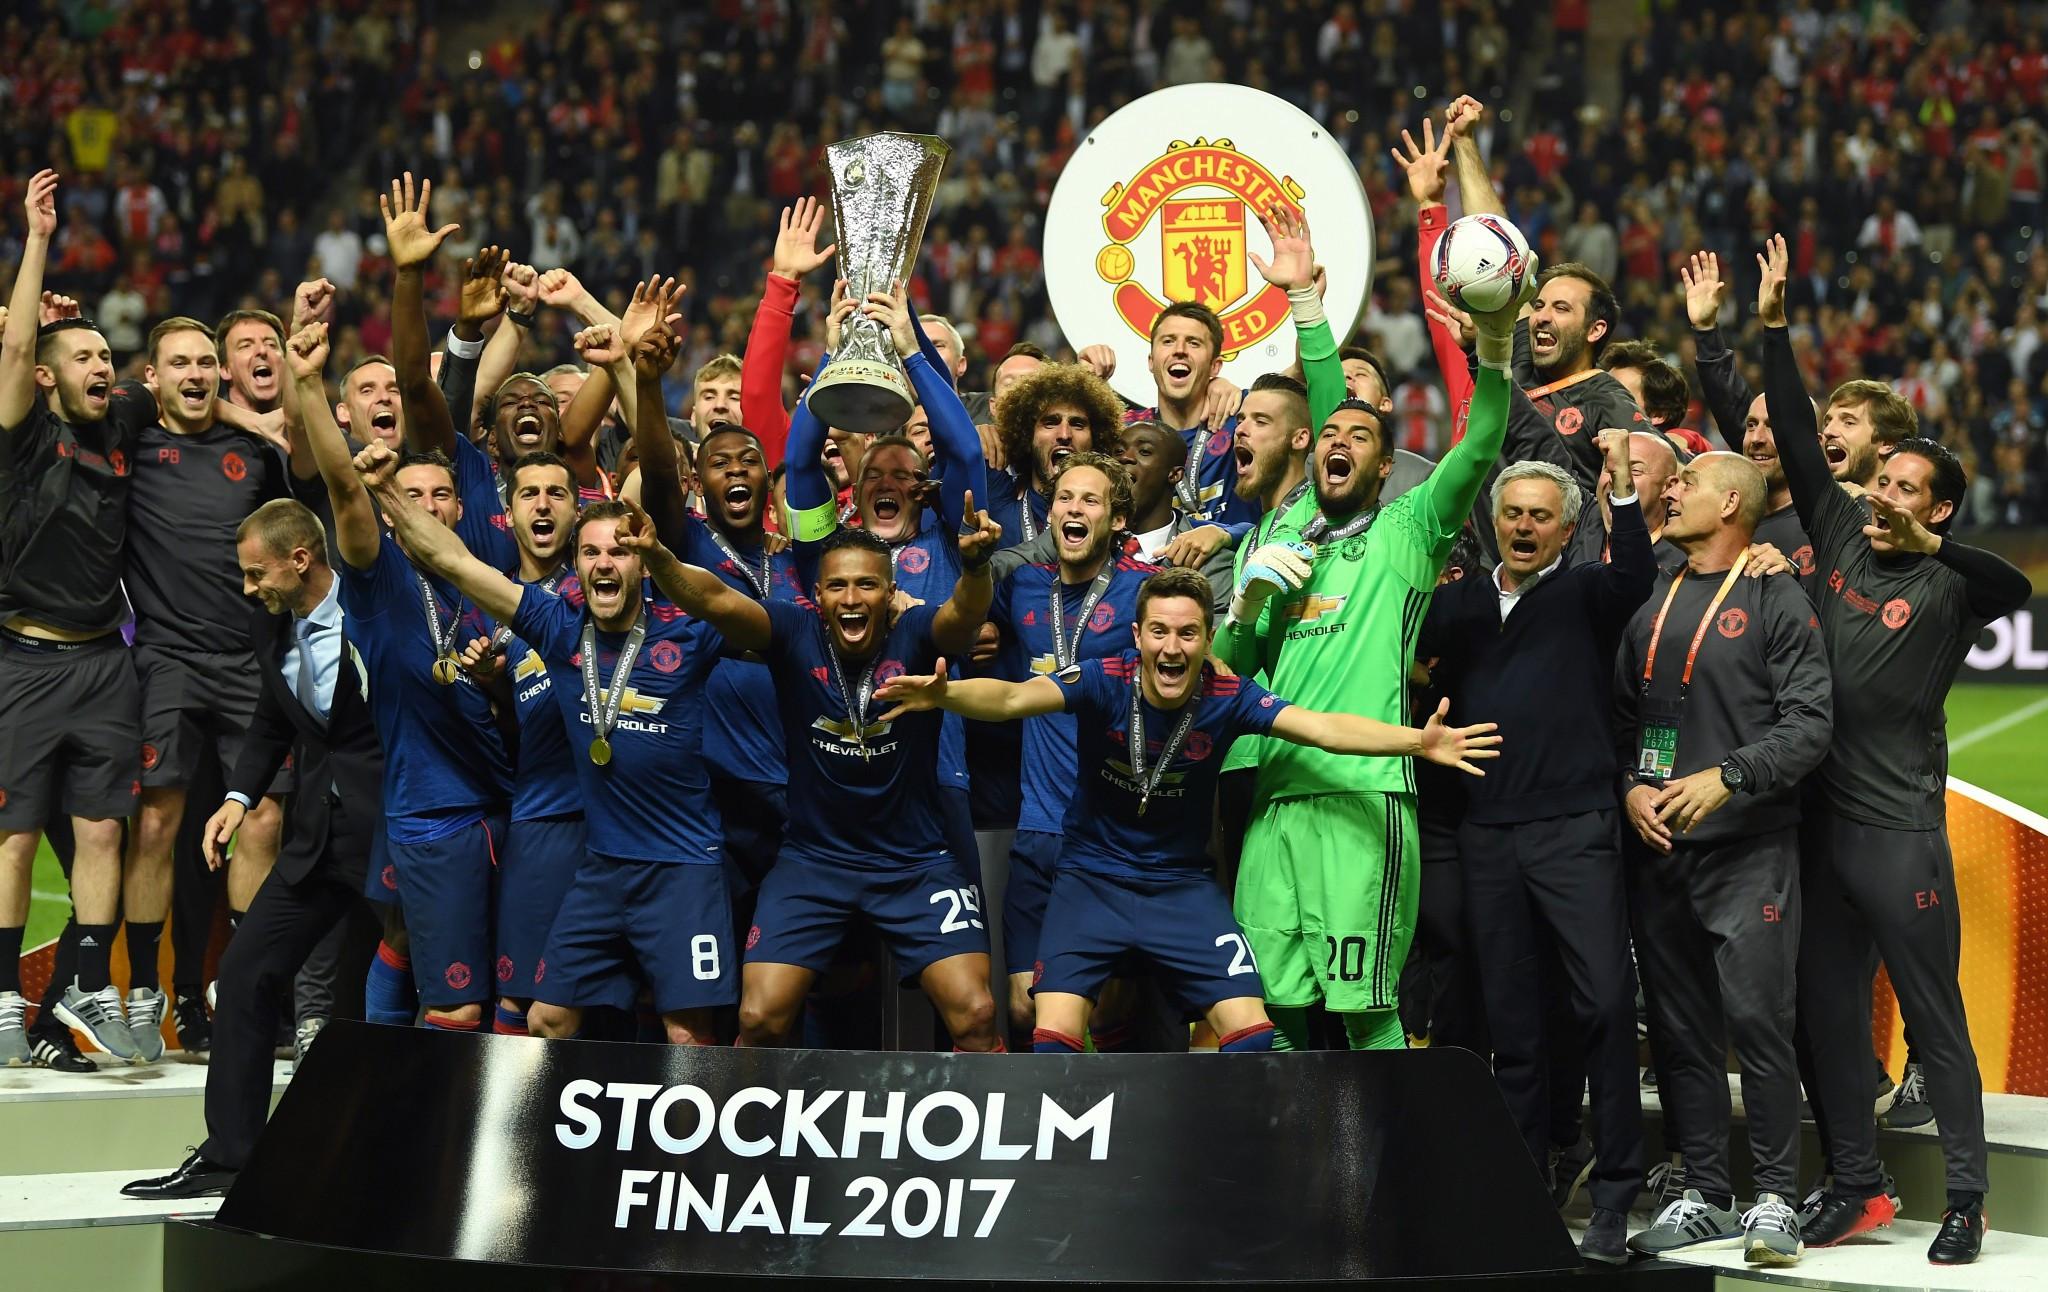 Phil Jones' European ban unfair, says Manchester United manager José Mourinho